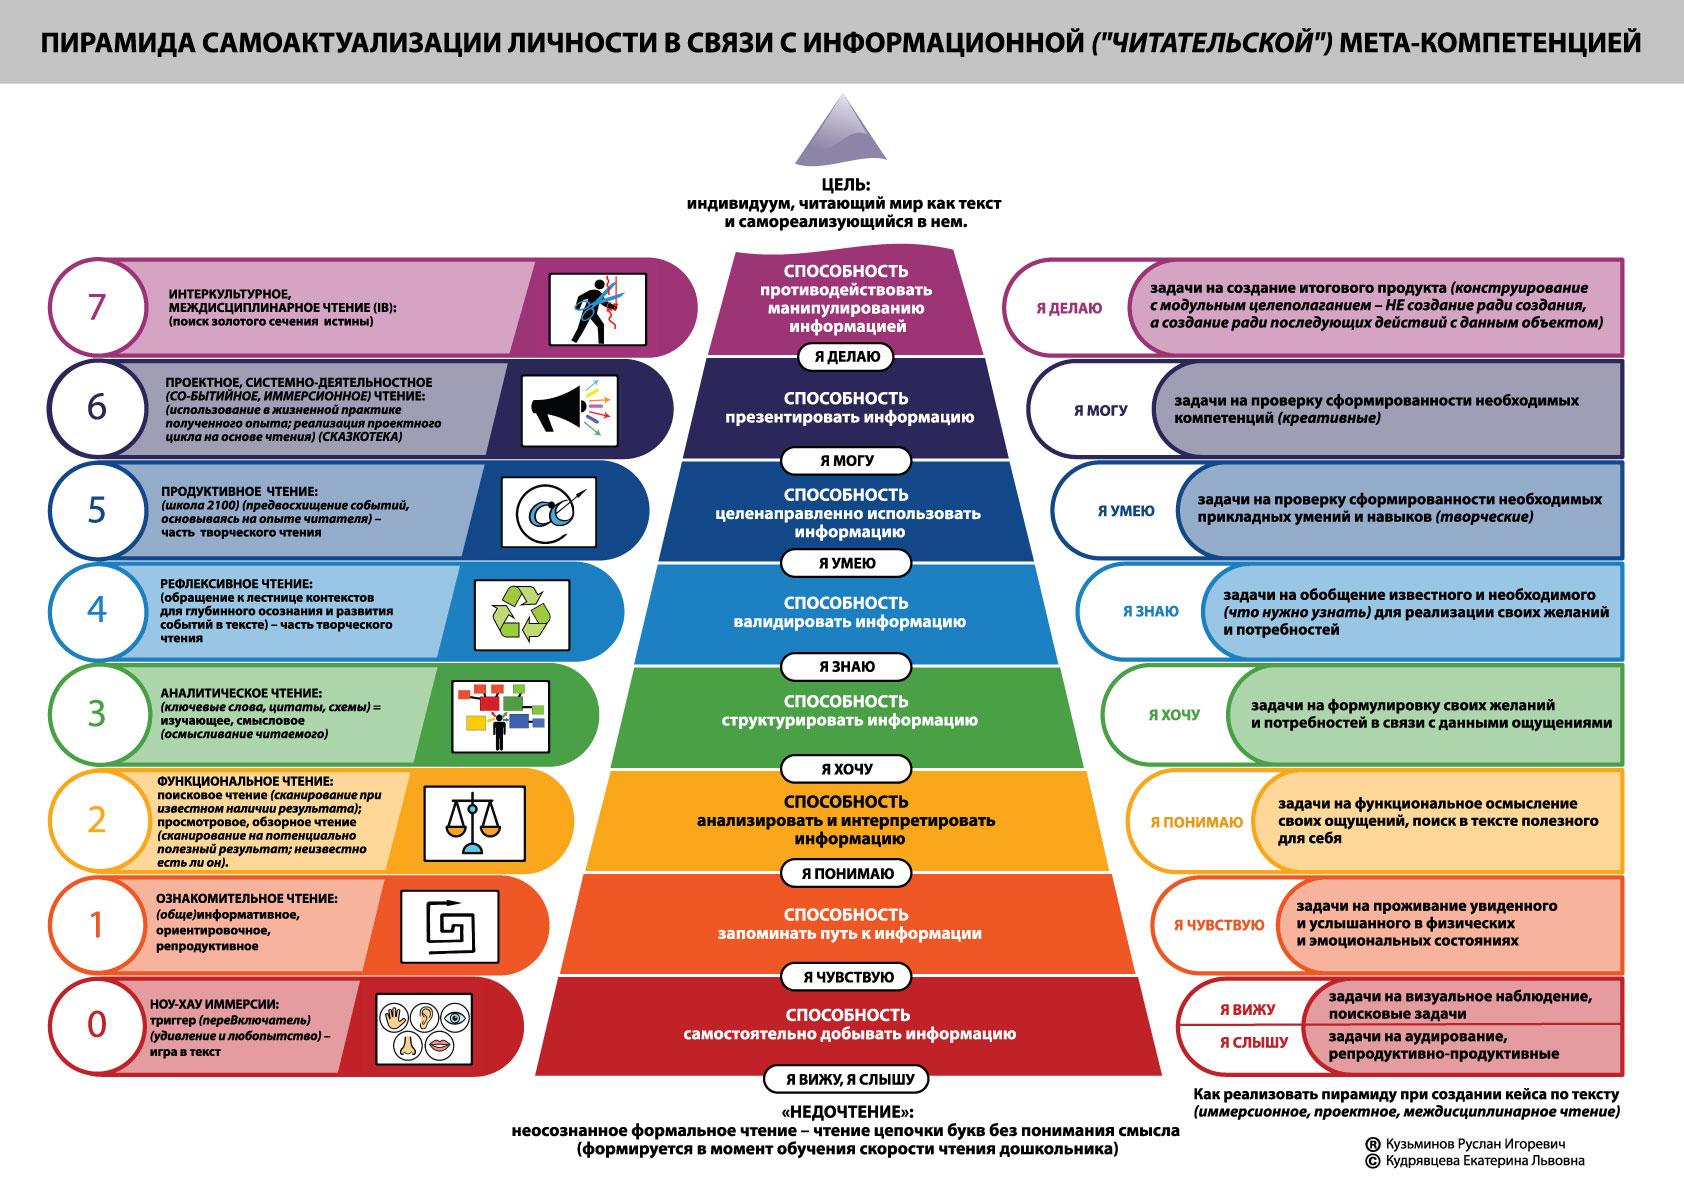 Piramida_2_Maket_A2.jpg